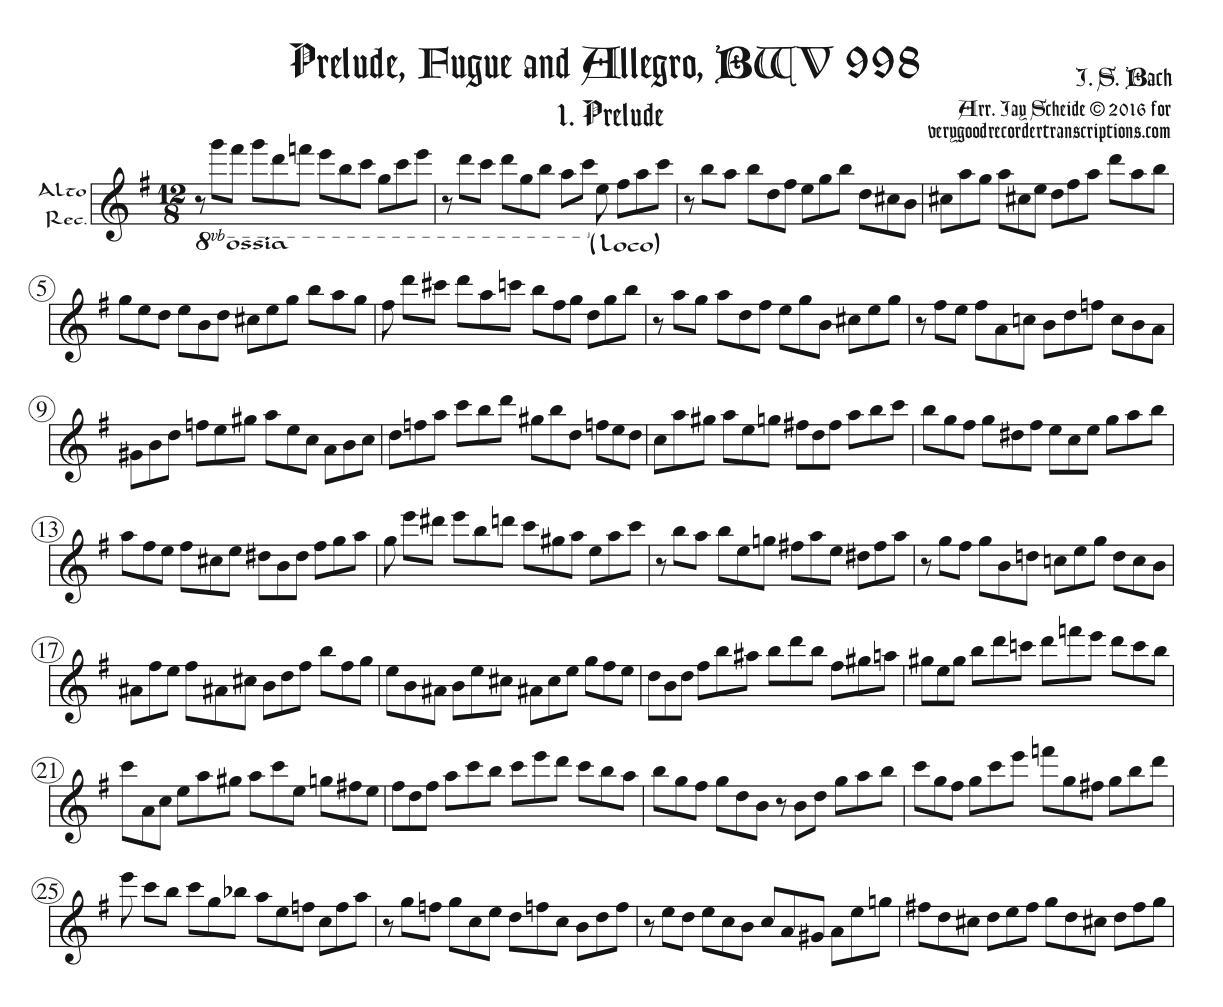 Prelude, Fugue and Allegro, BWV 998